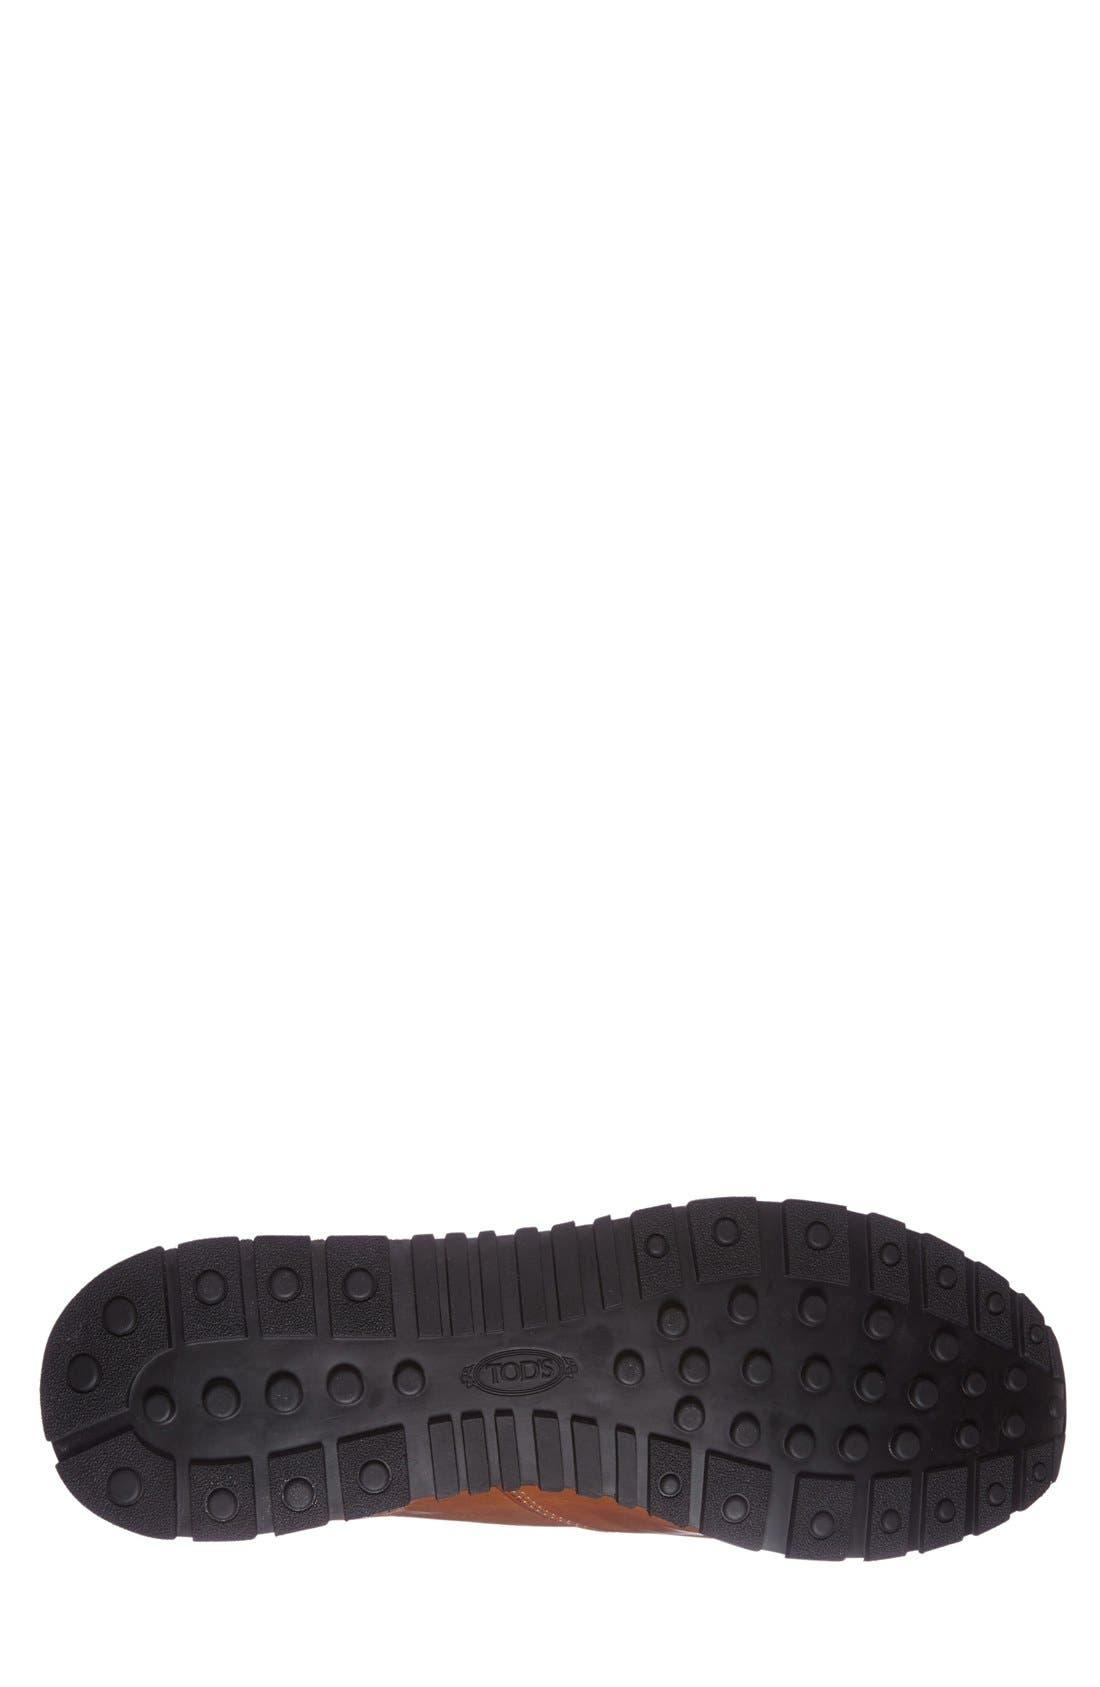 'Allacciato' Sneaker,                             Alternate thumbnail 18, color,